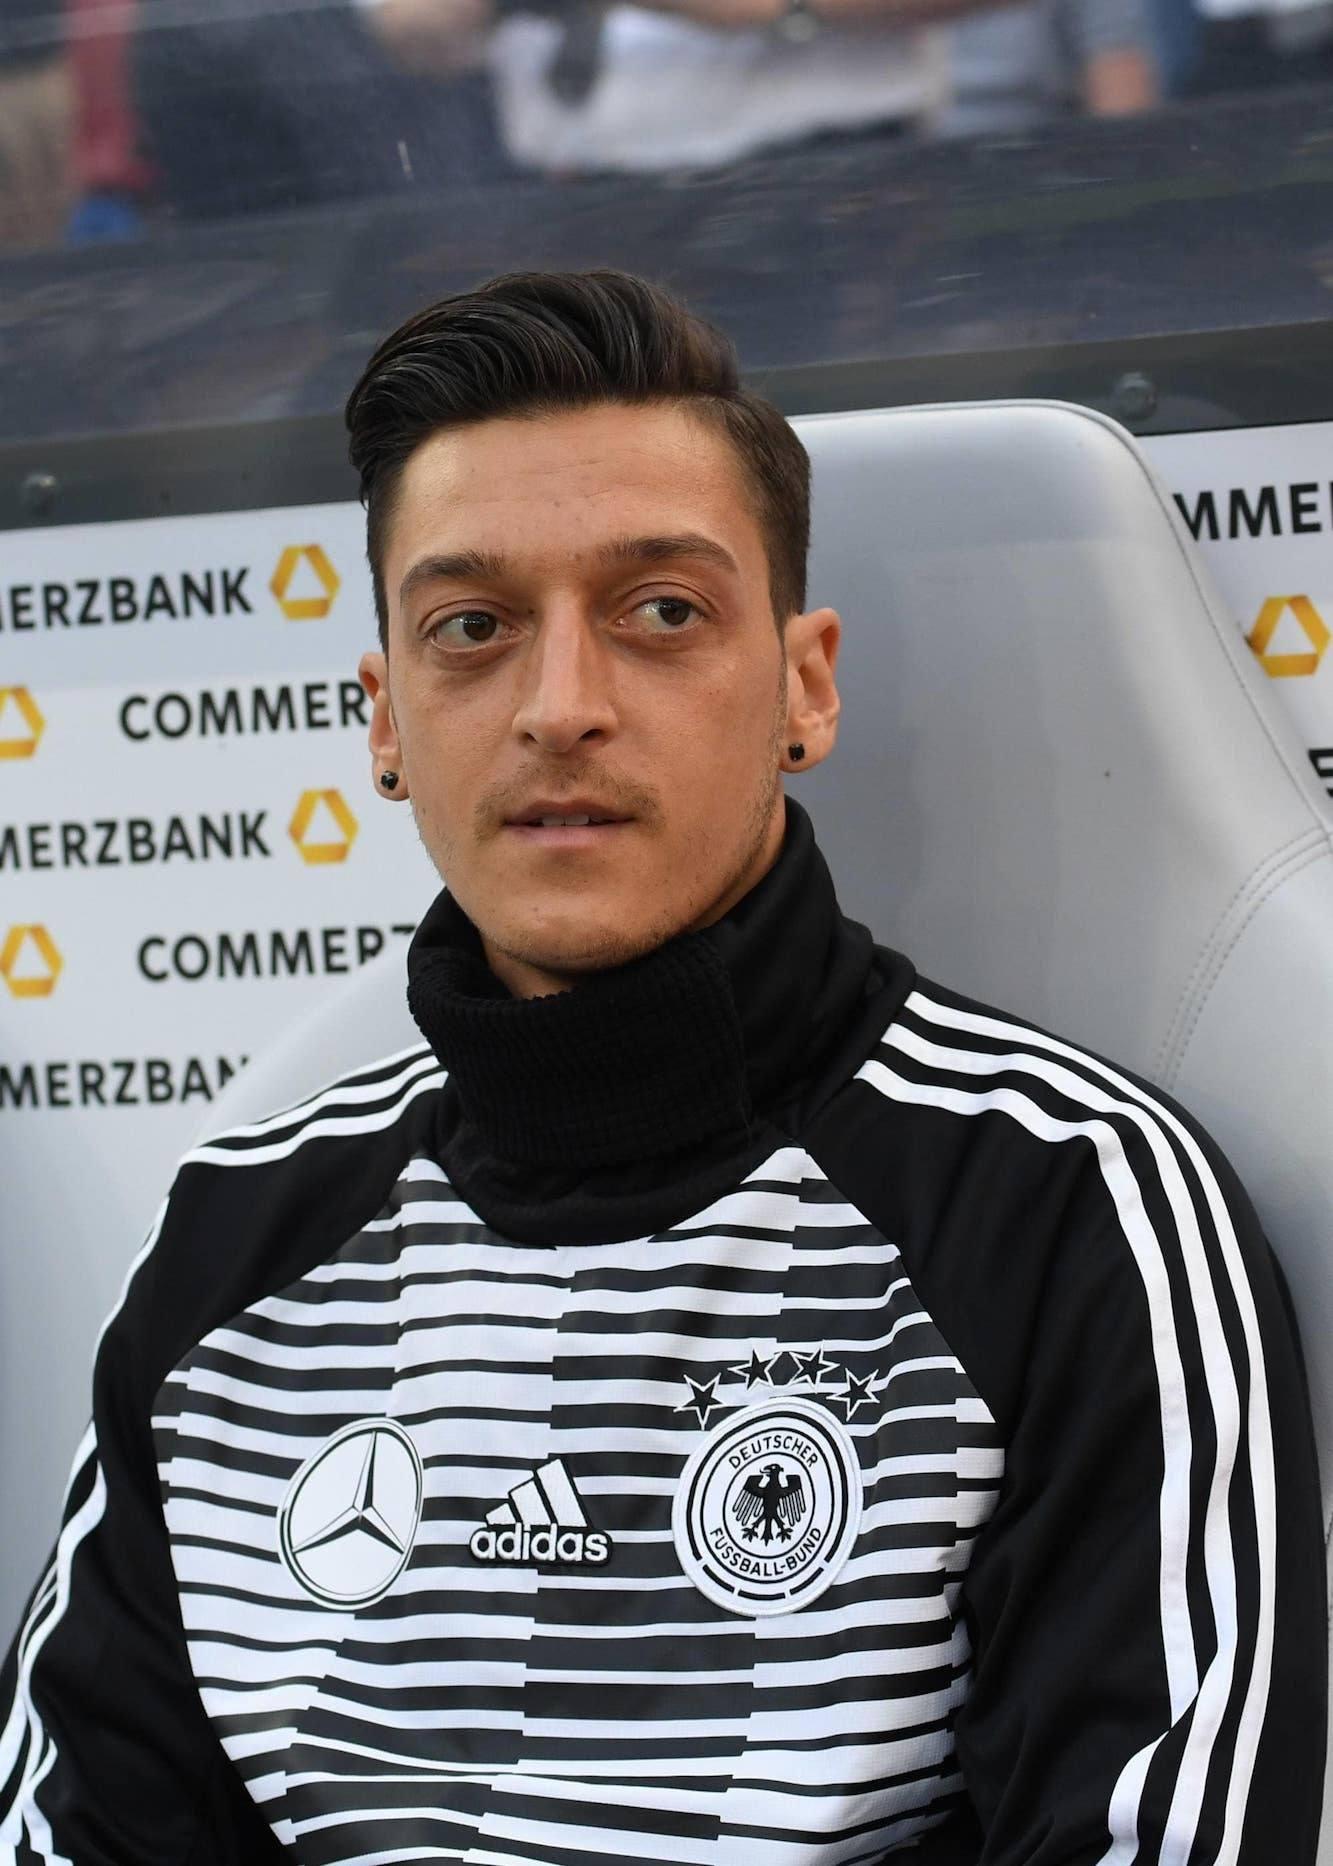 Mesut Ozil gaya rambut side parted comb over.